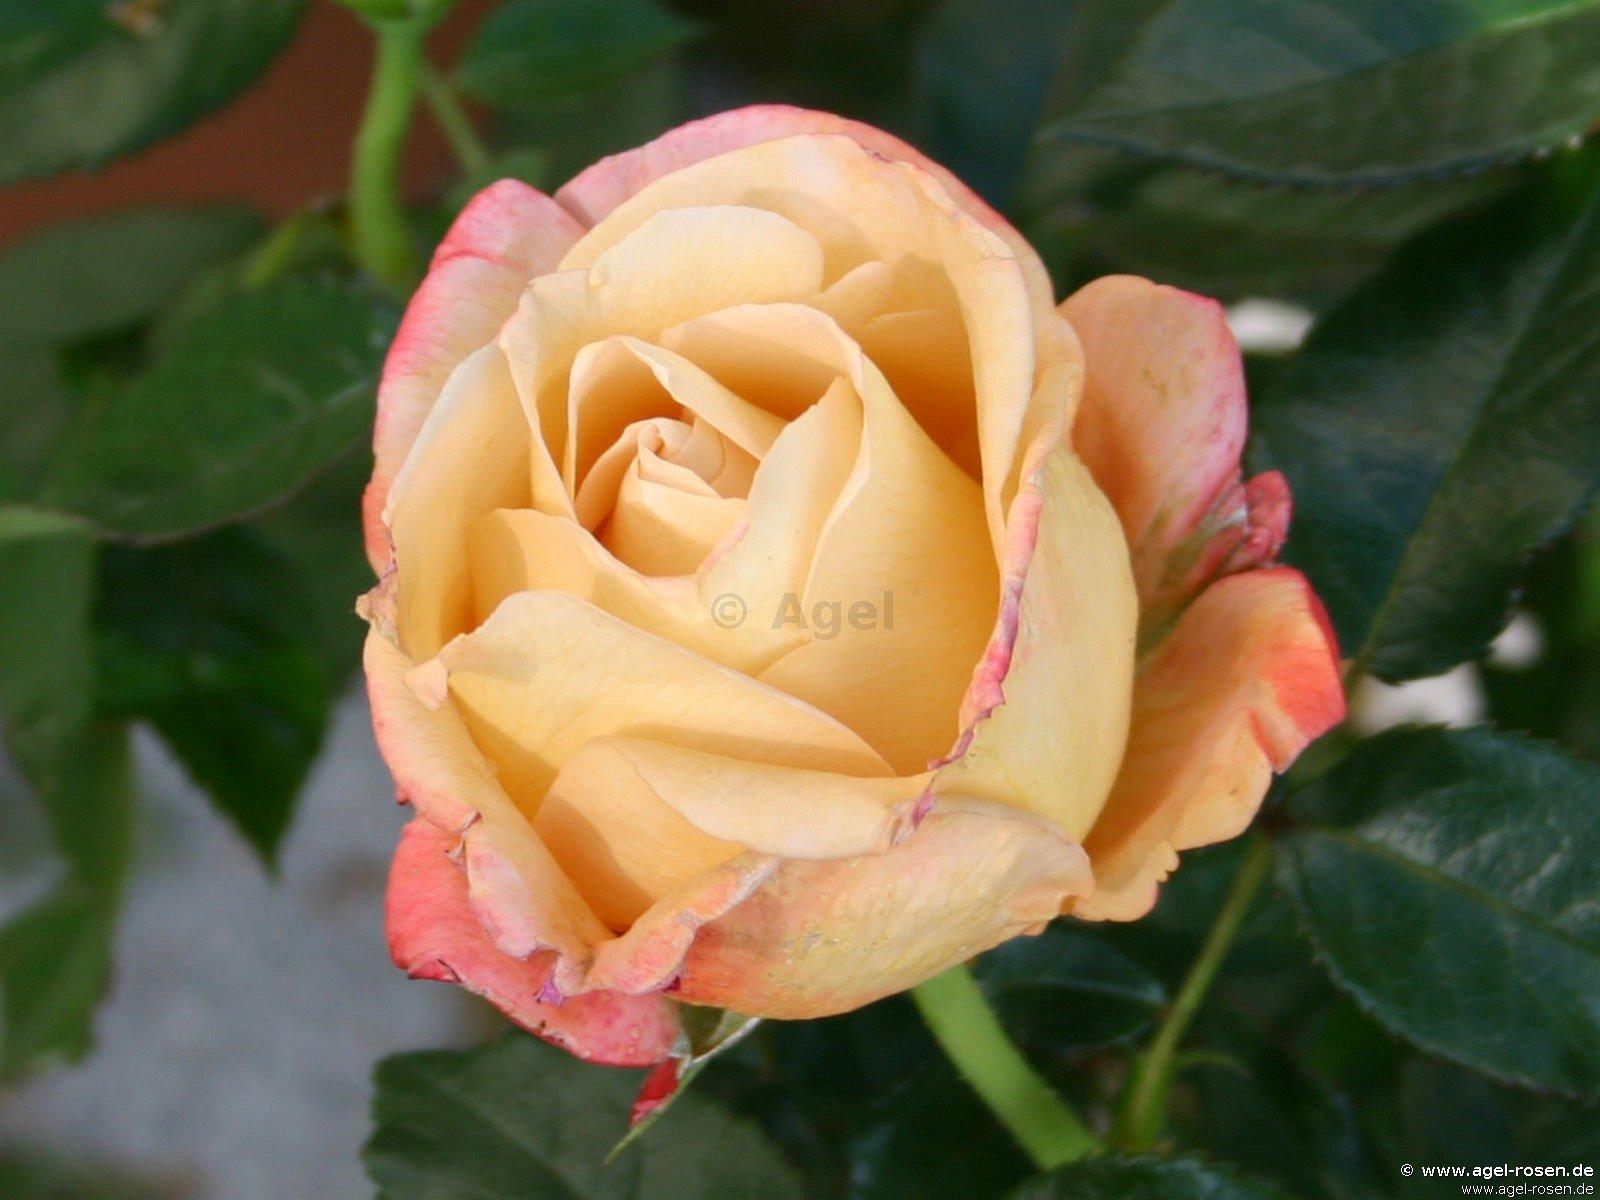 vend e imp riale edelrose kaufen bei agel rosen. Black Bedroom Furniture Sets. Home Design Ideas